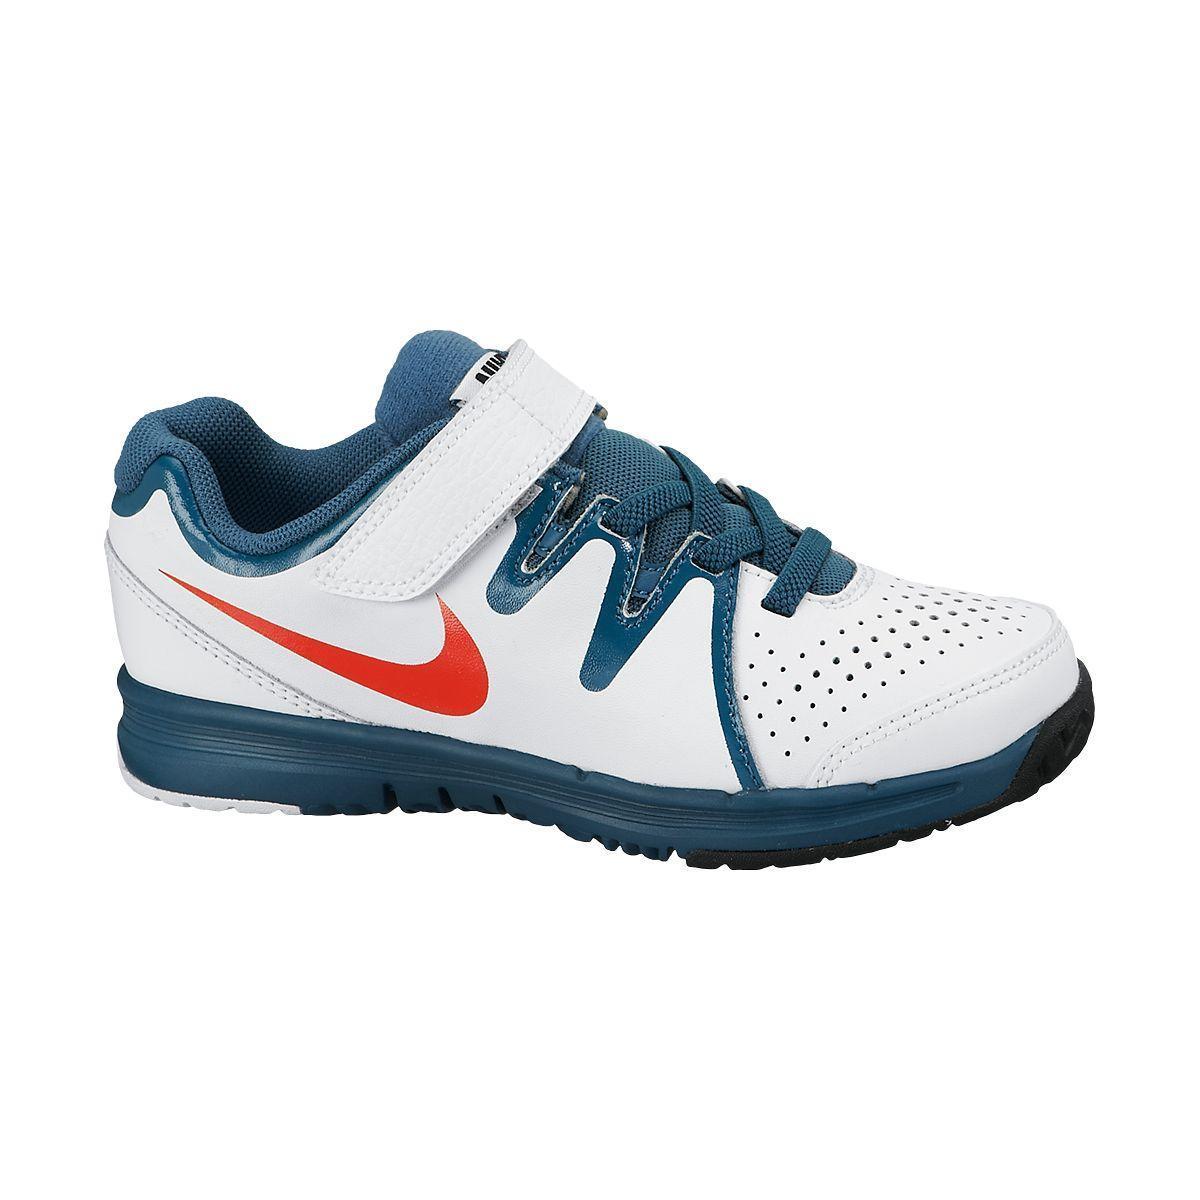 Nike Little Boys Vapor Court Tennis Shoes - White/Blue ...